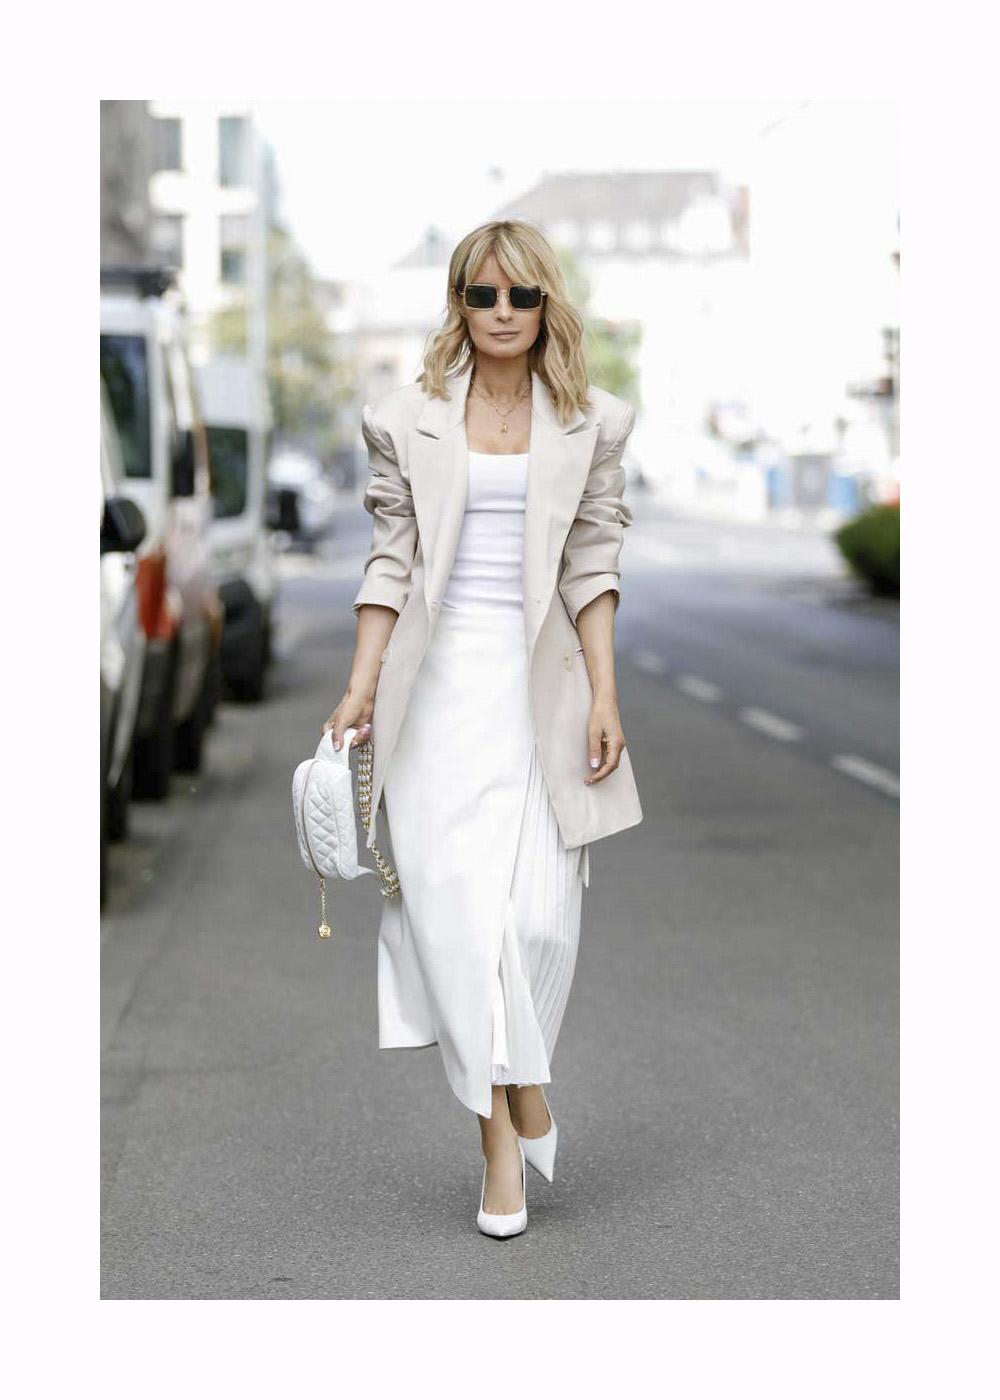 Street Style – Duesseldorf – May 19, 2020